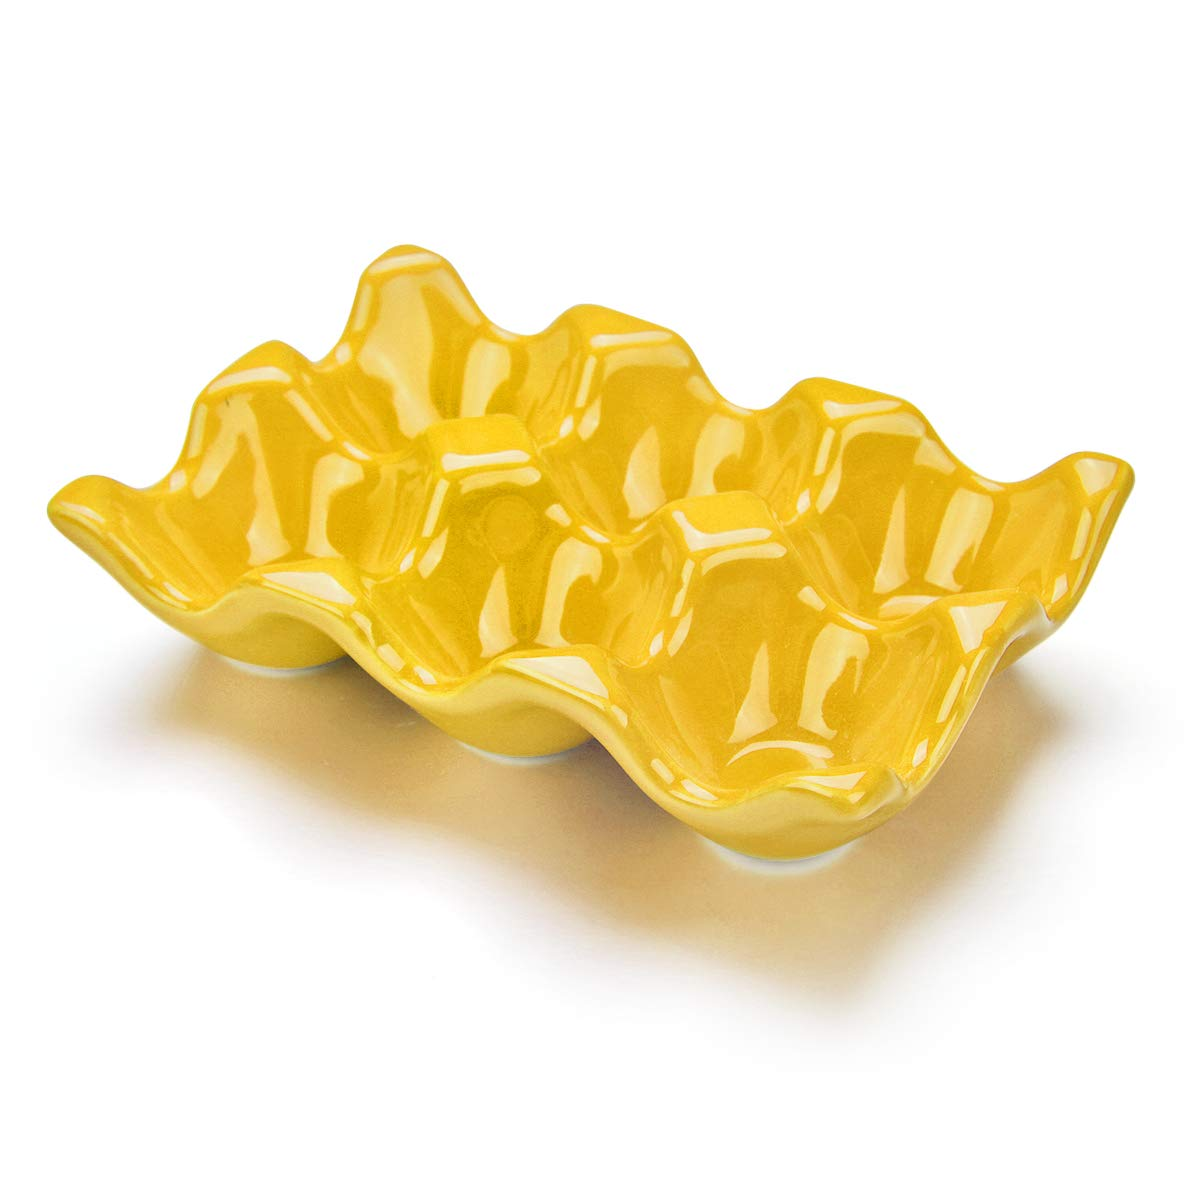 URWOOW Ceramic 6 Cup Egg Holder Half Dozen White Porcelain Tray Carton Crate Storage Keeper Storer (Yellow)